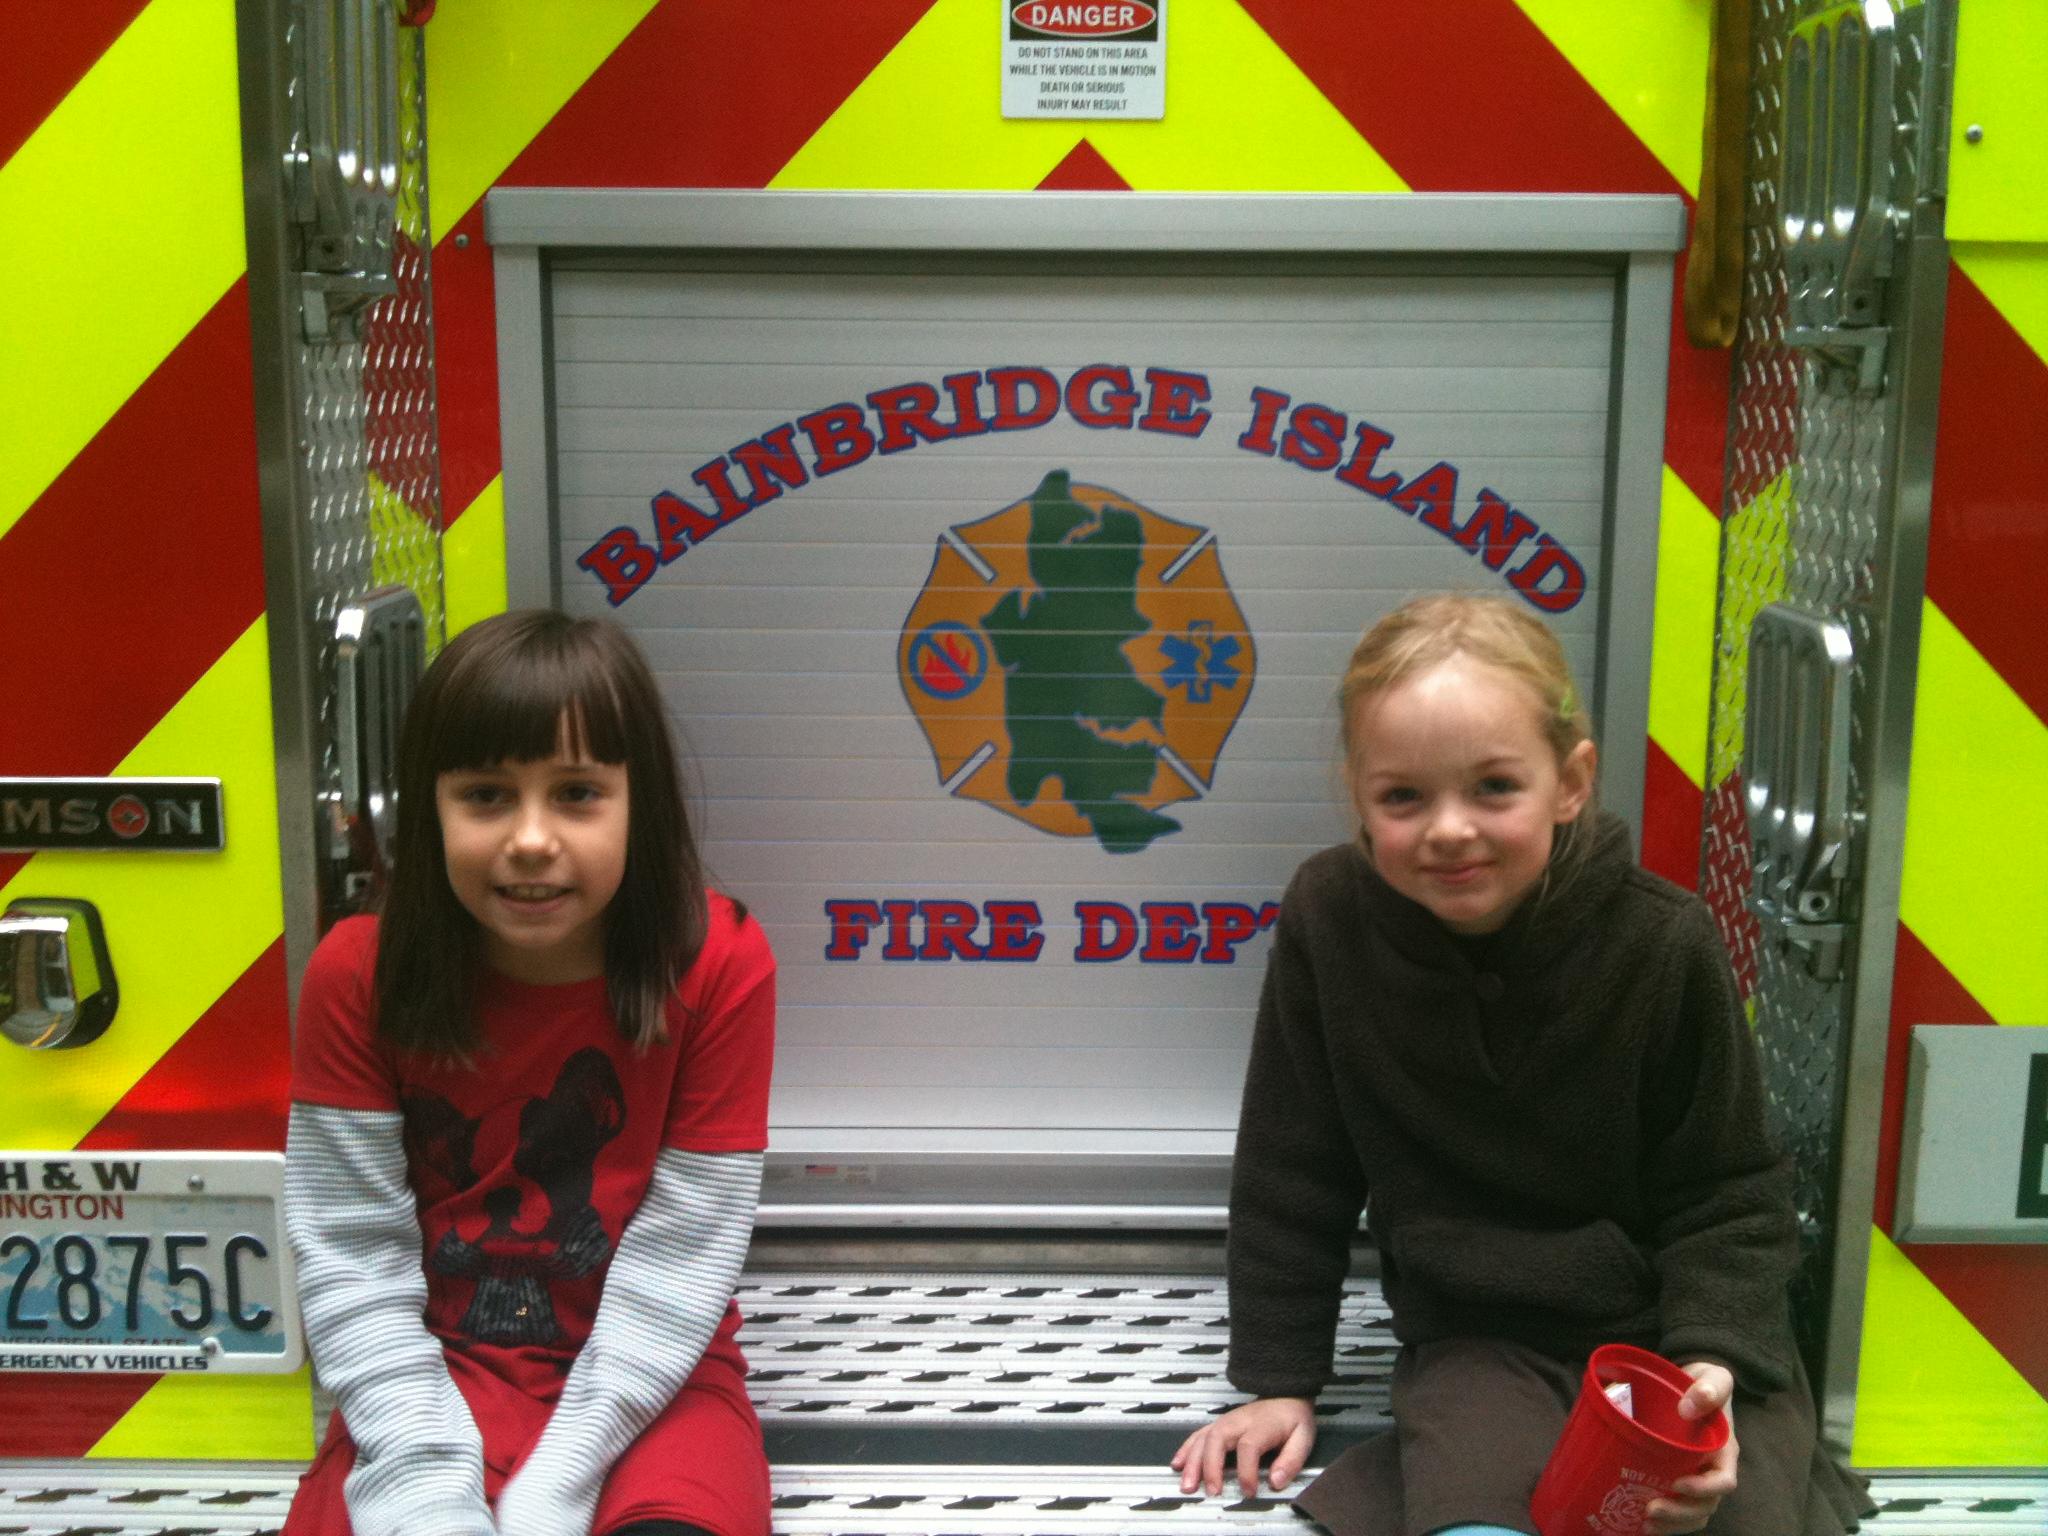 Bainbridge Fire Department